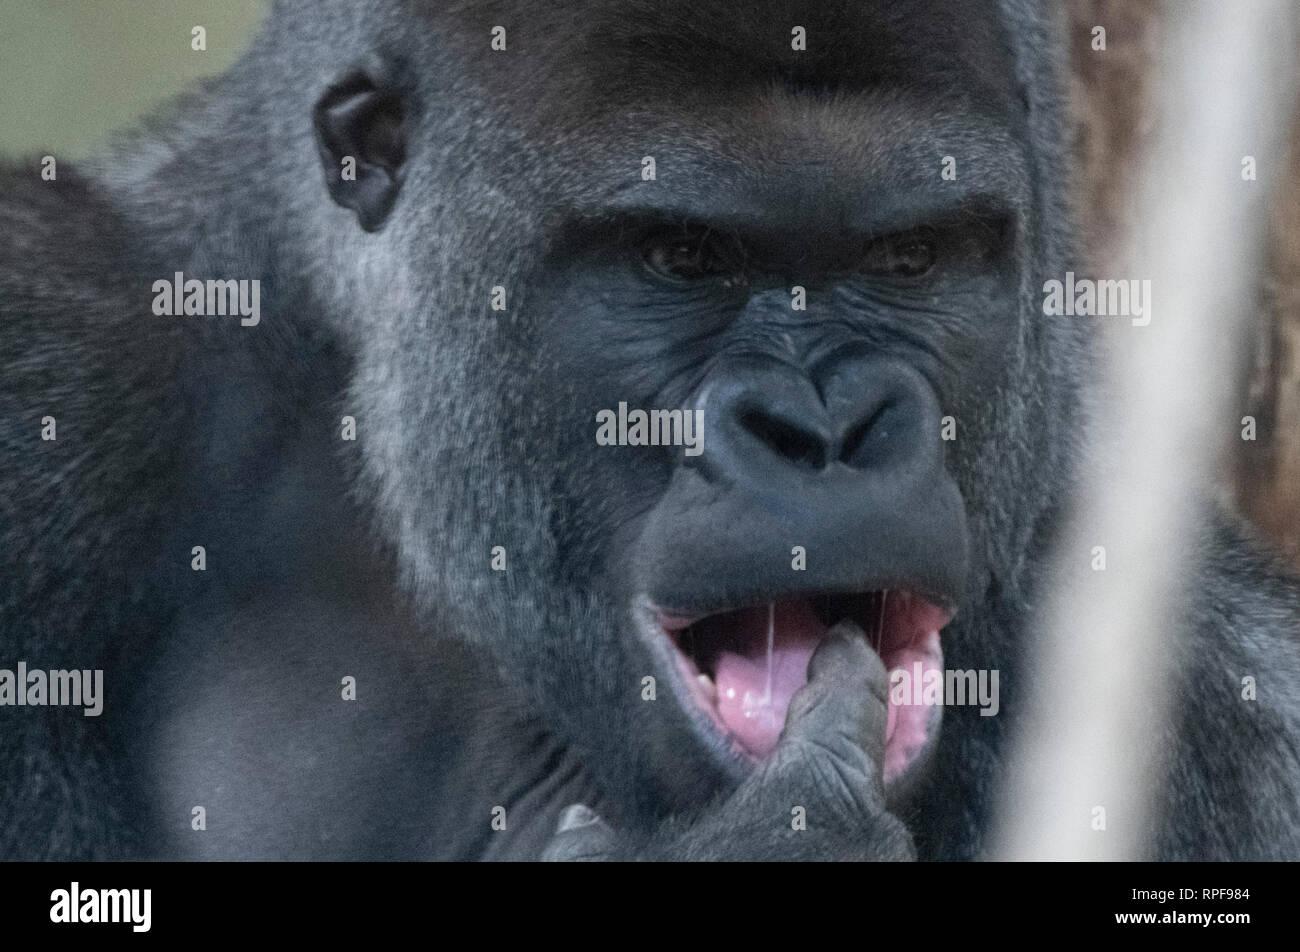 Berlin, Germany  17th Feb, 2019  The new gorilla man Sango